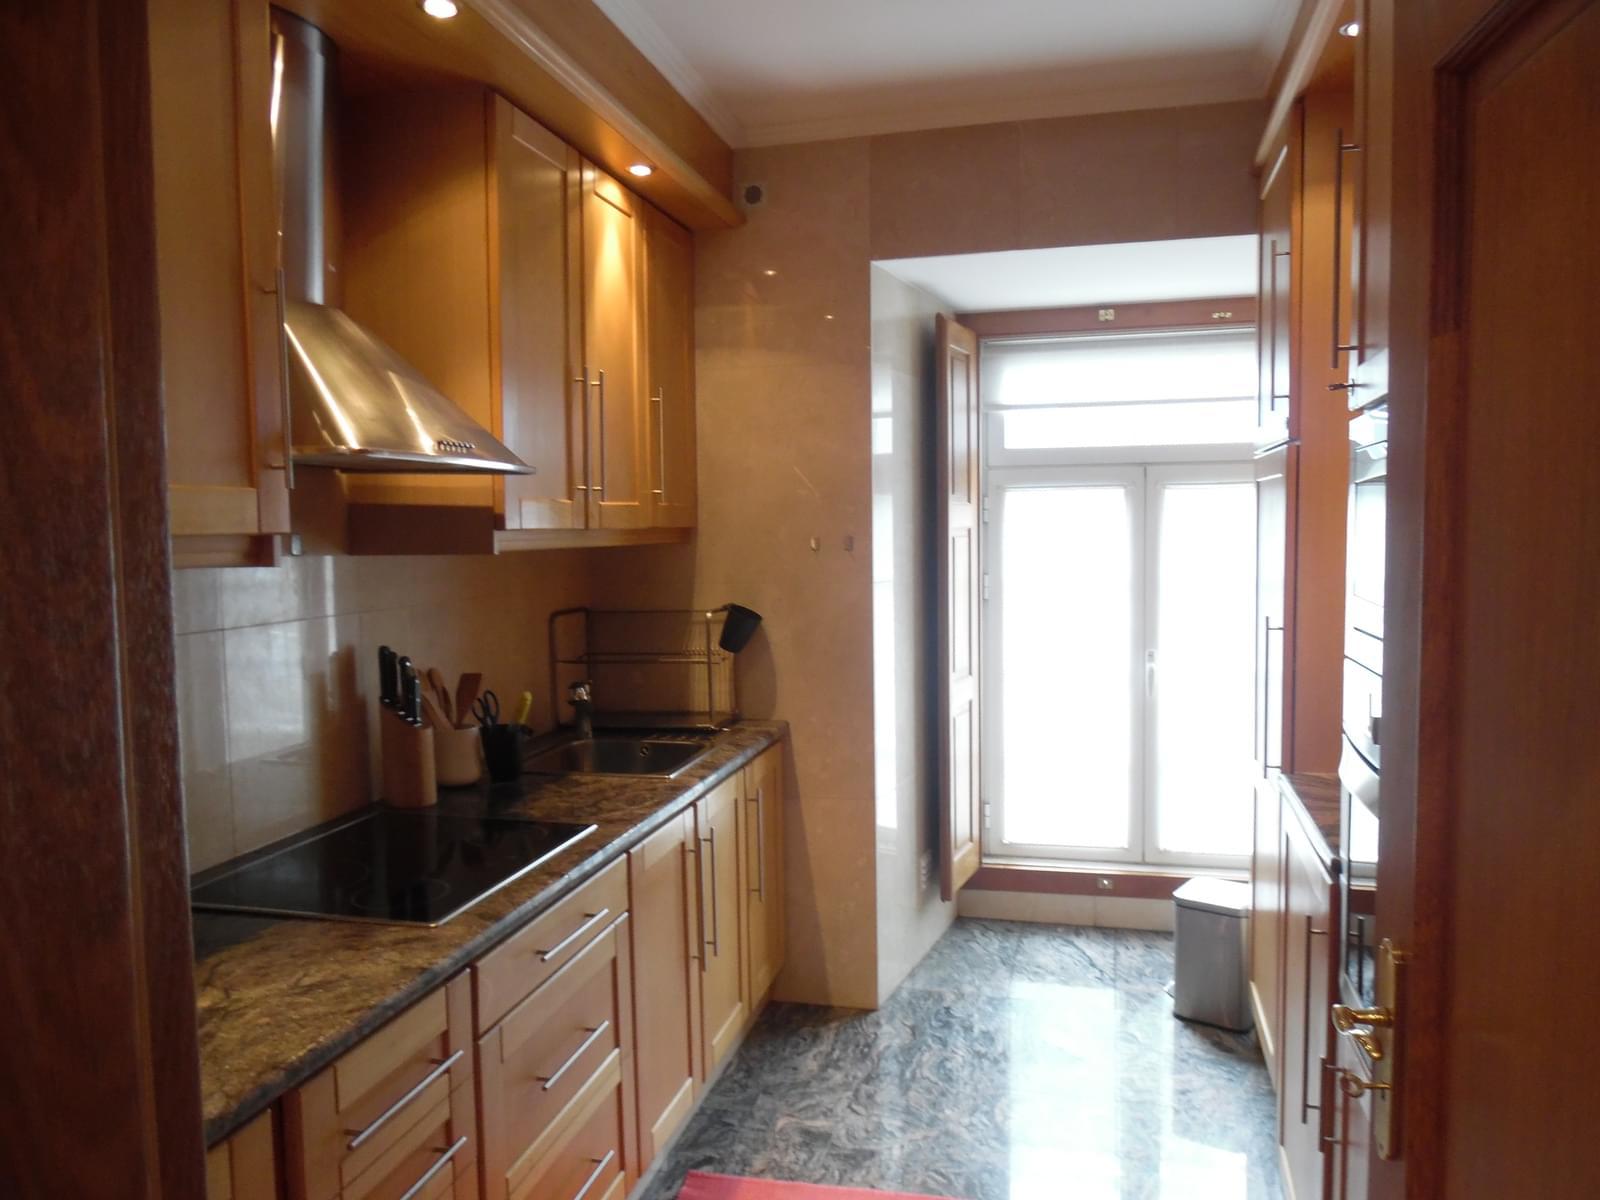 pf16905-apartamento-t1-lisboa-8638b0fa-0c3e-4336-a4f3-eb599bd3b5c5